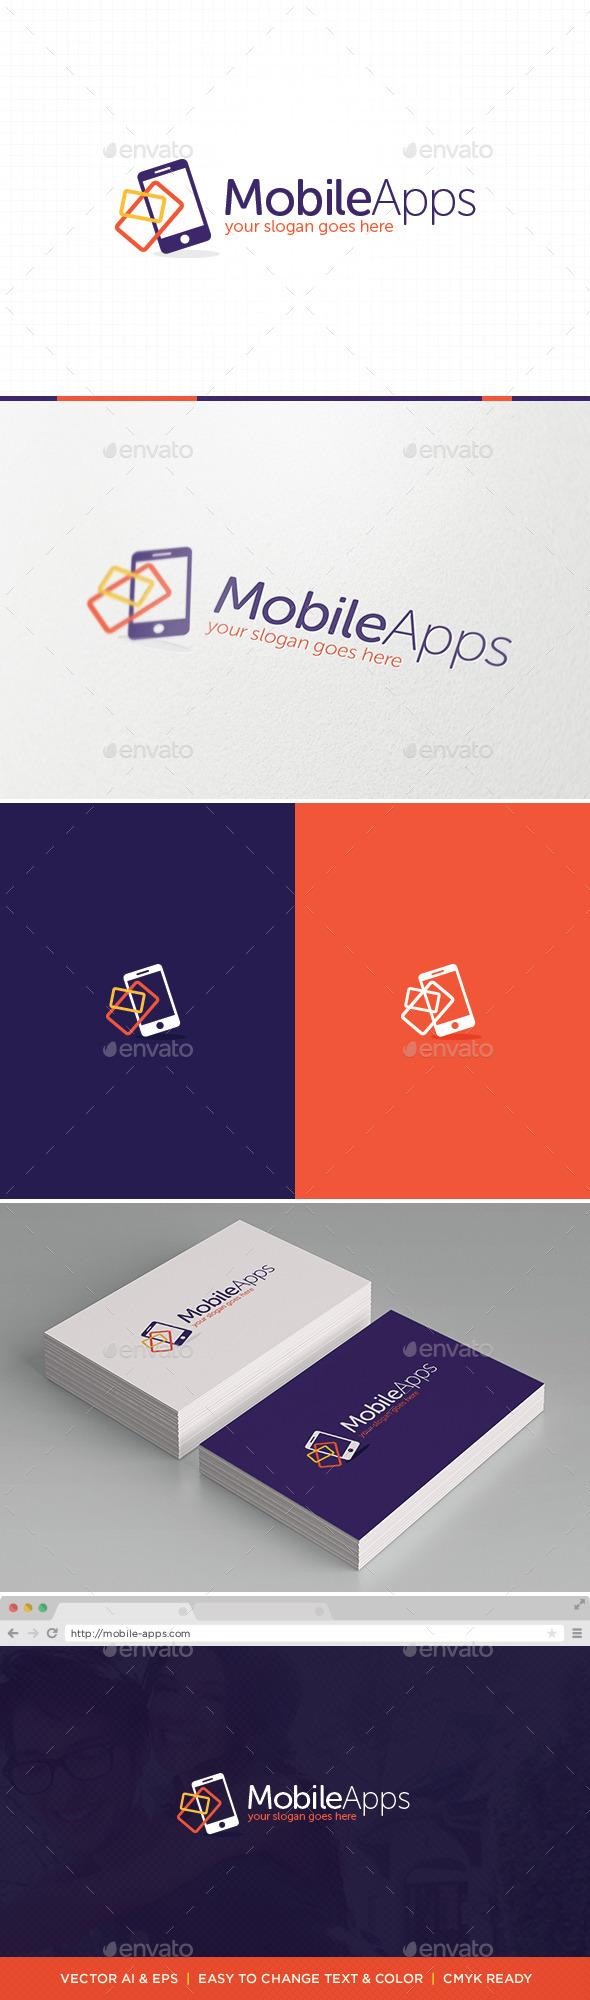 Mobile Apps Logo - Symbols Logo Templates